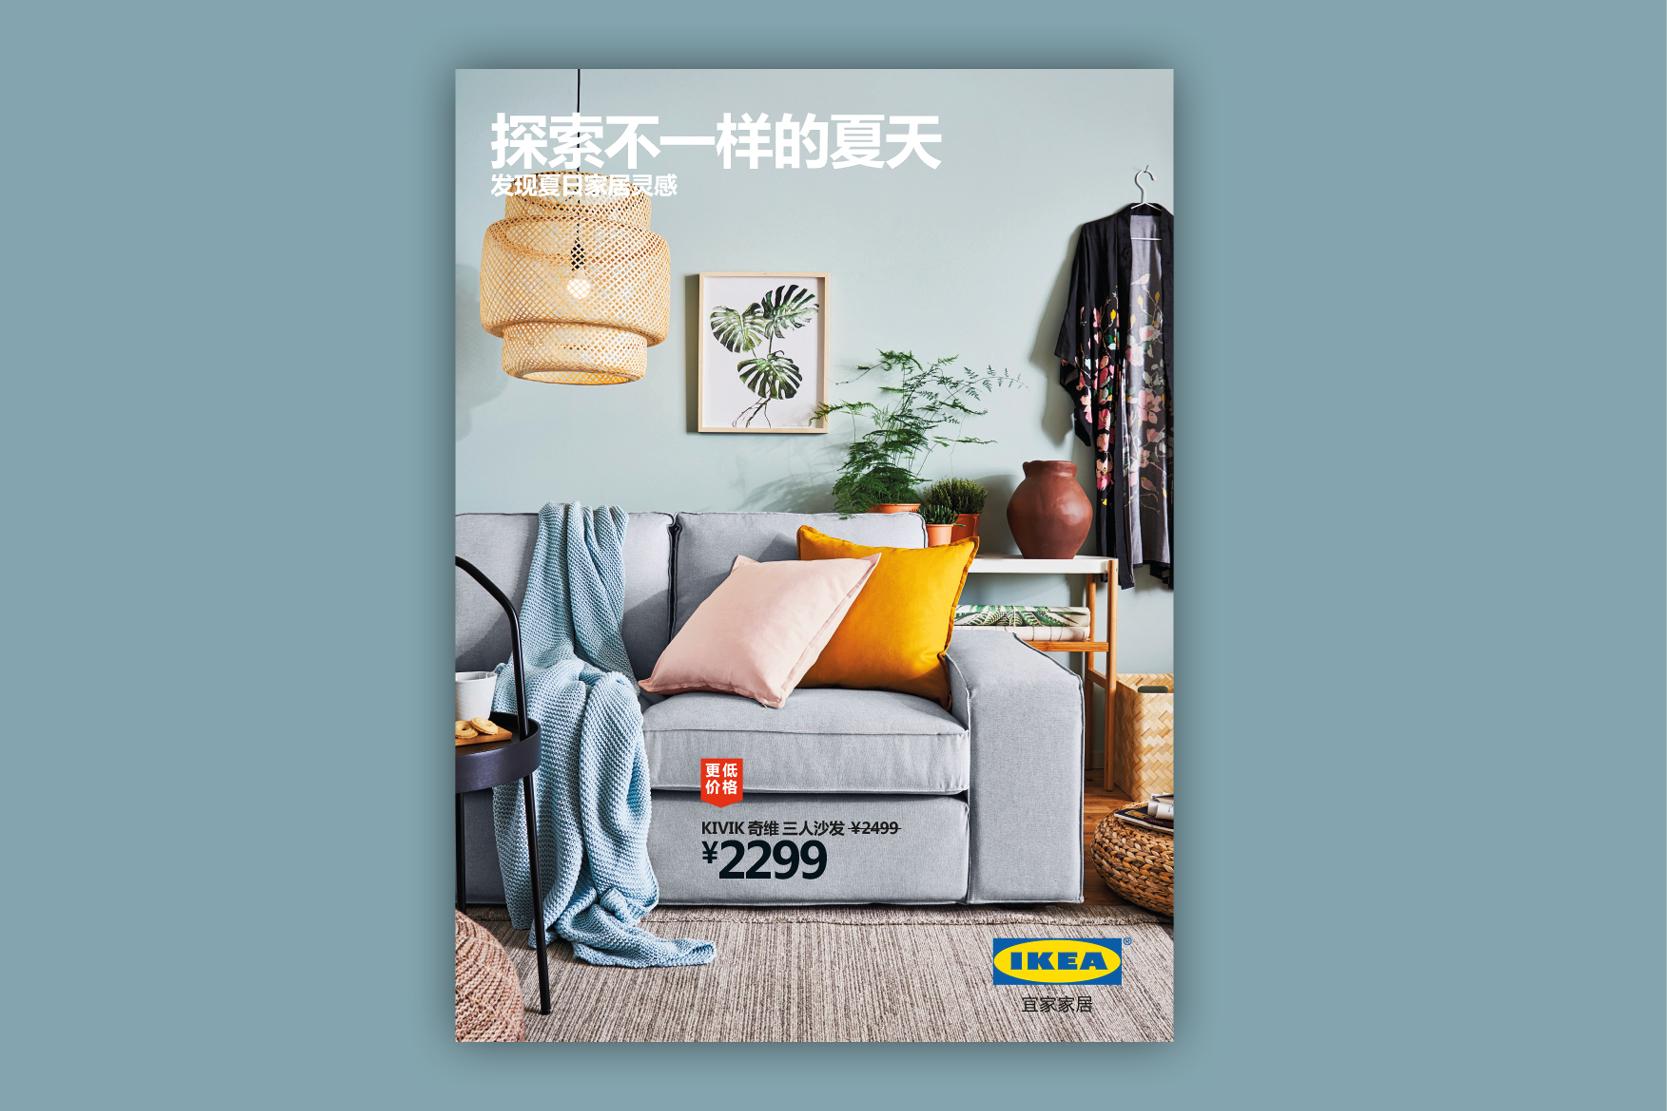 IKEA China broschure